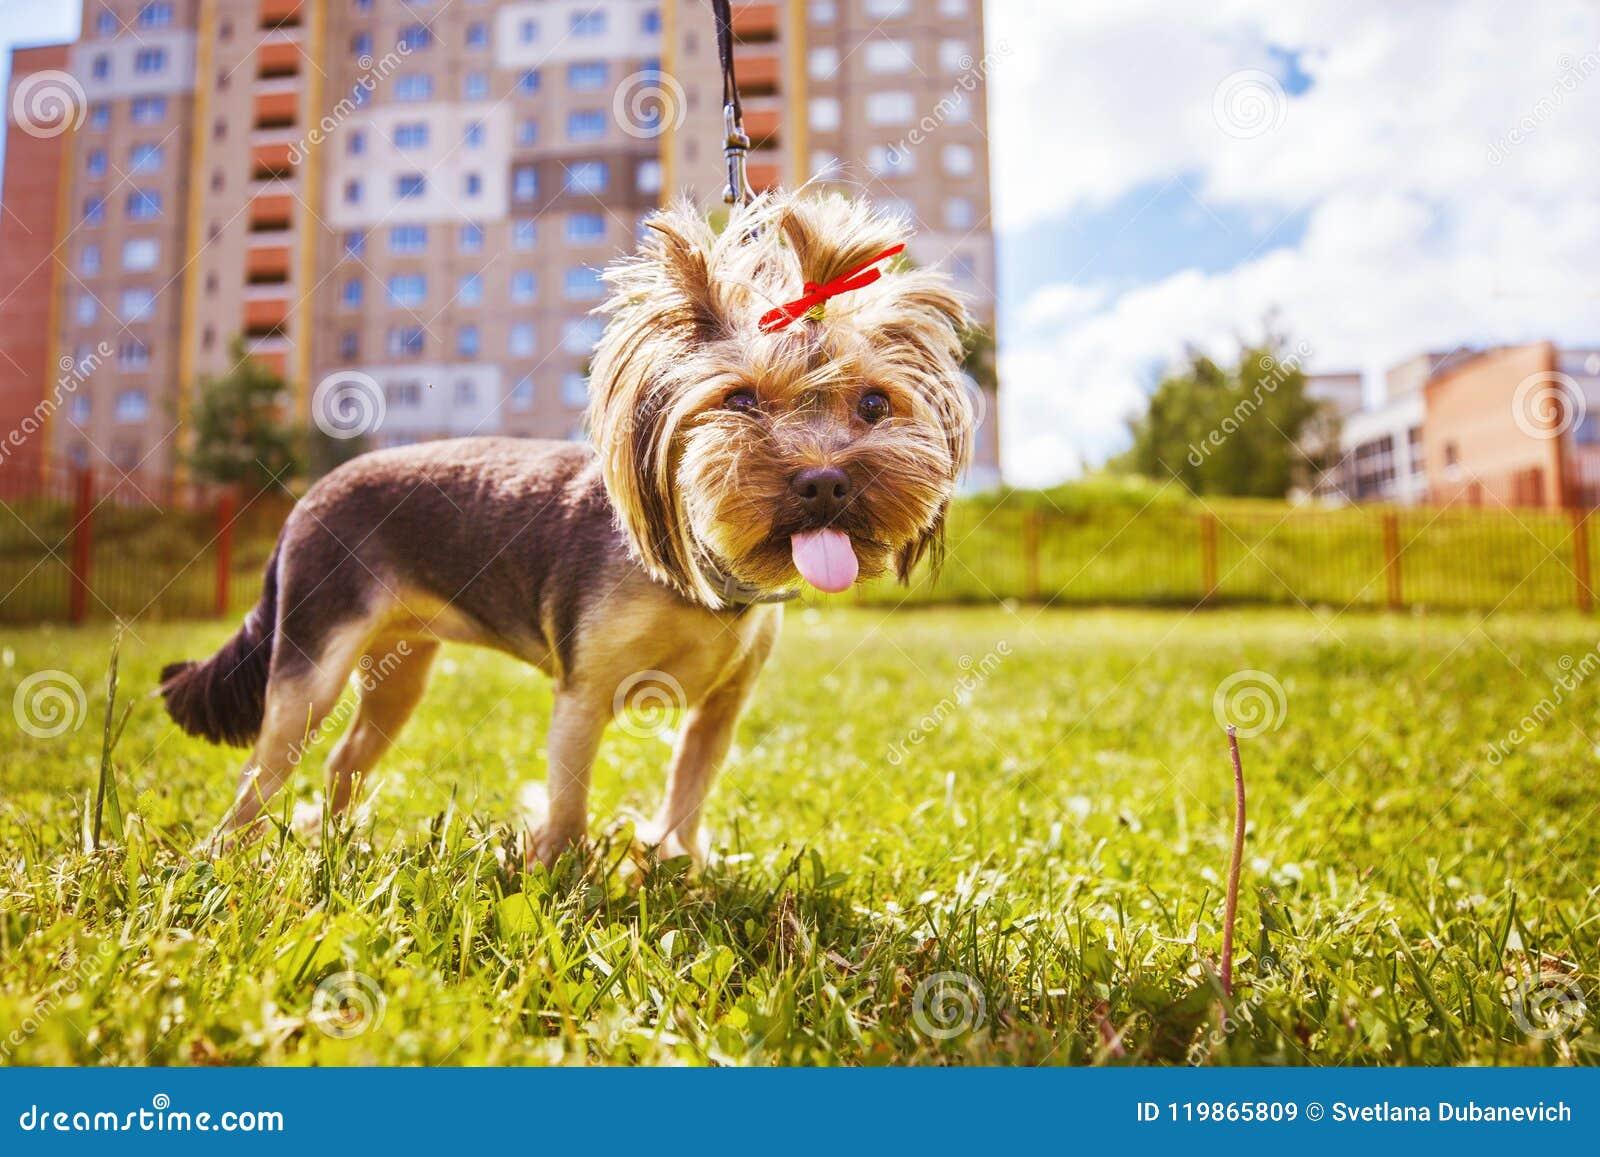 Little dog walks . a portrait of a Yorkshire terrier